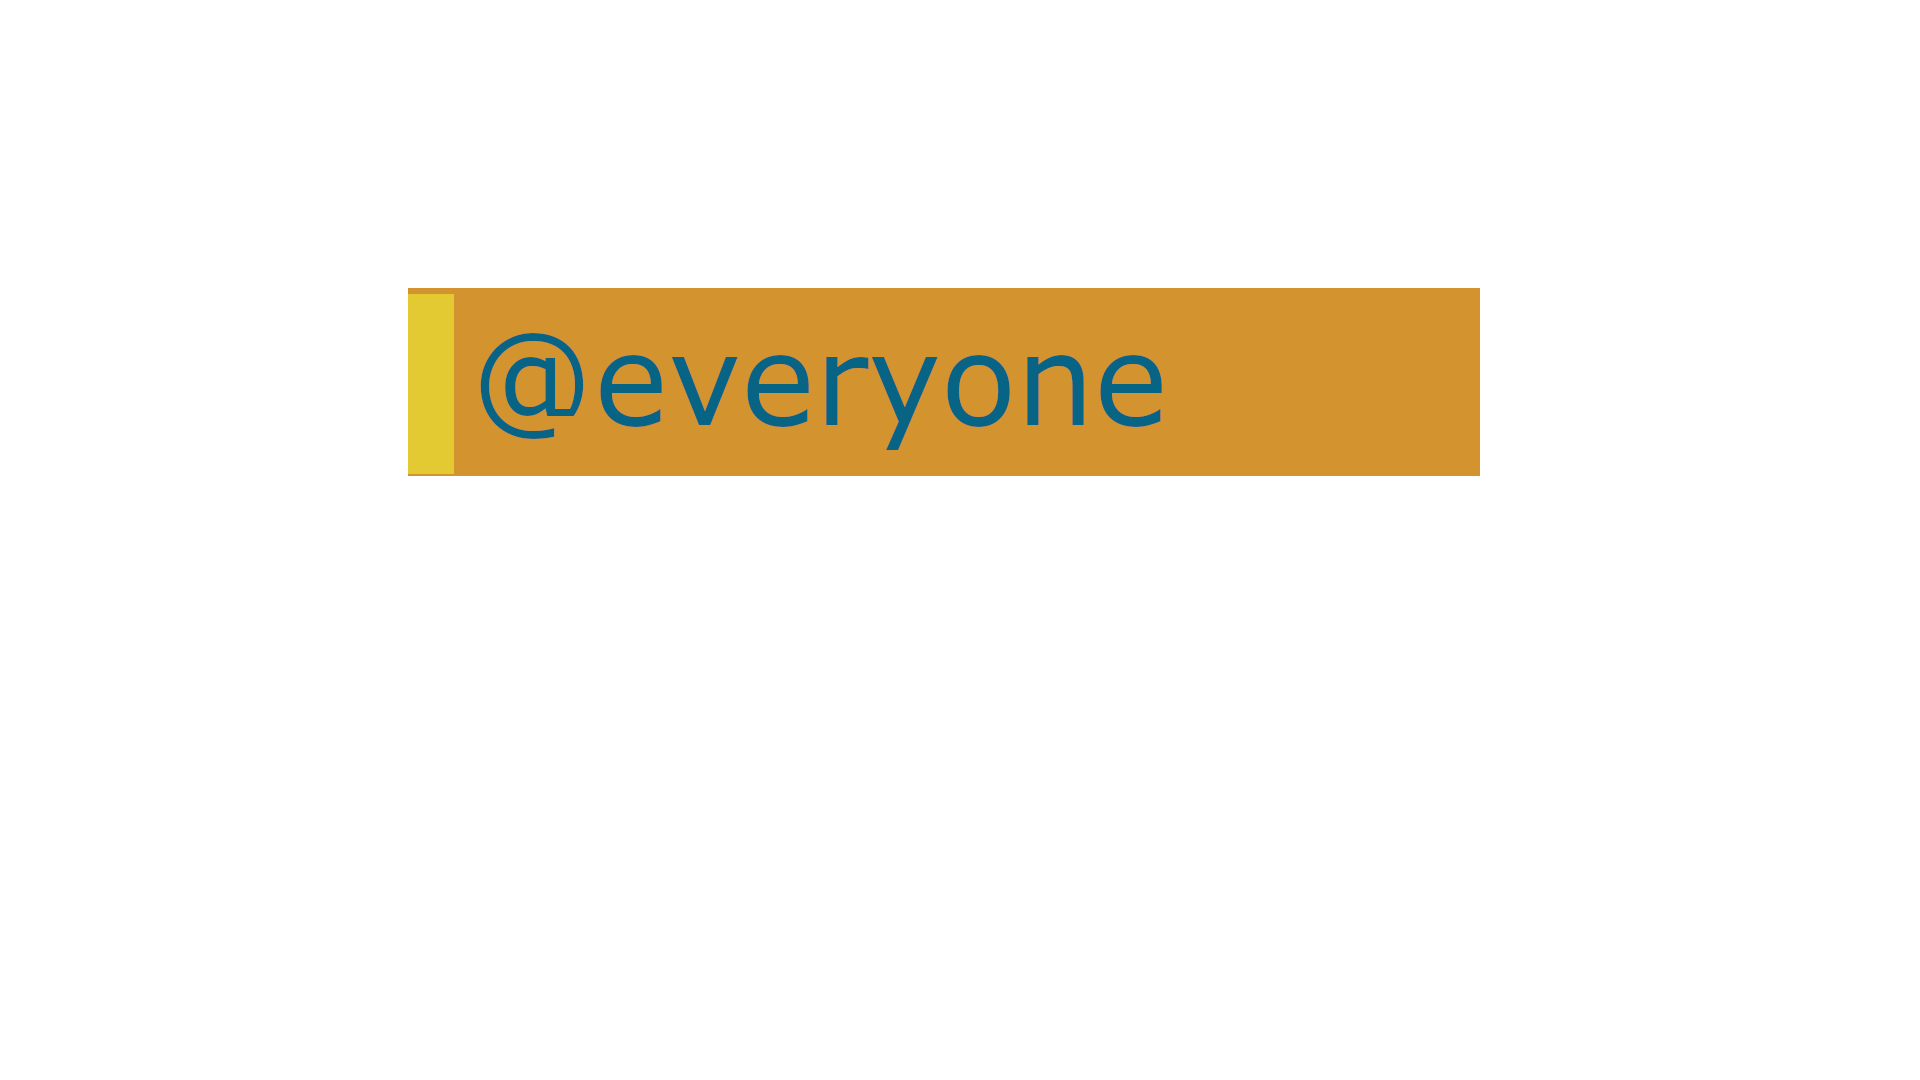 @everyone